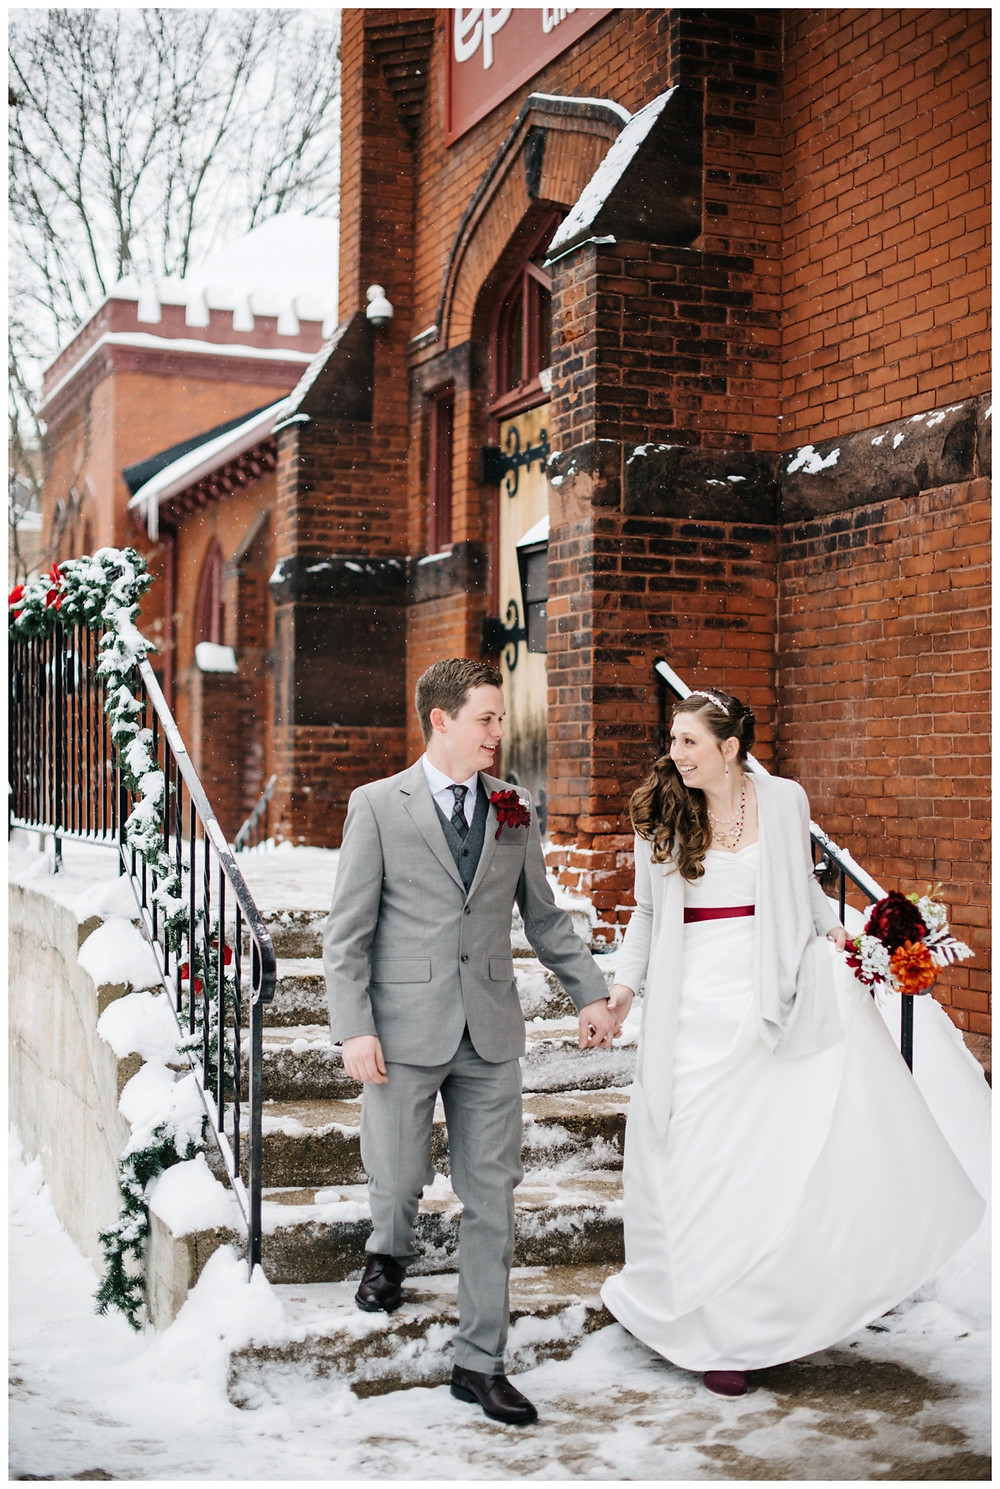 bride-and-groom-smiling-down-snowy-steps-at-milwaukee-wedding-by-milwaukee-wedding-photographer-kyra-rane-photographer